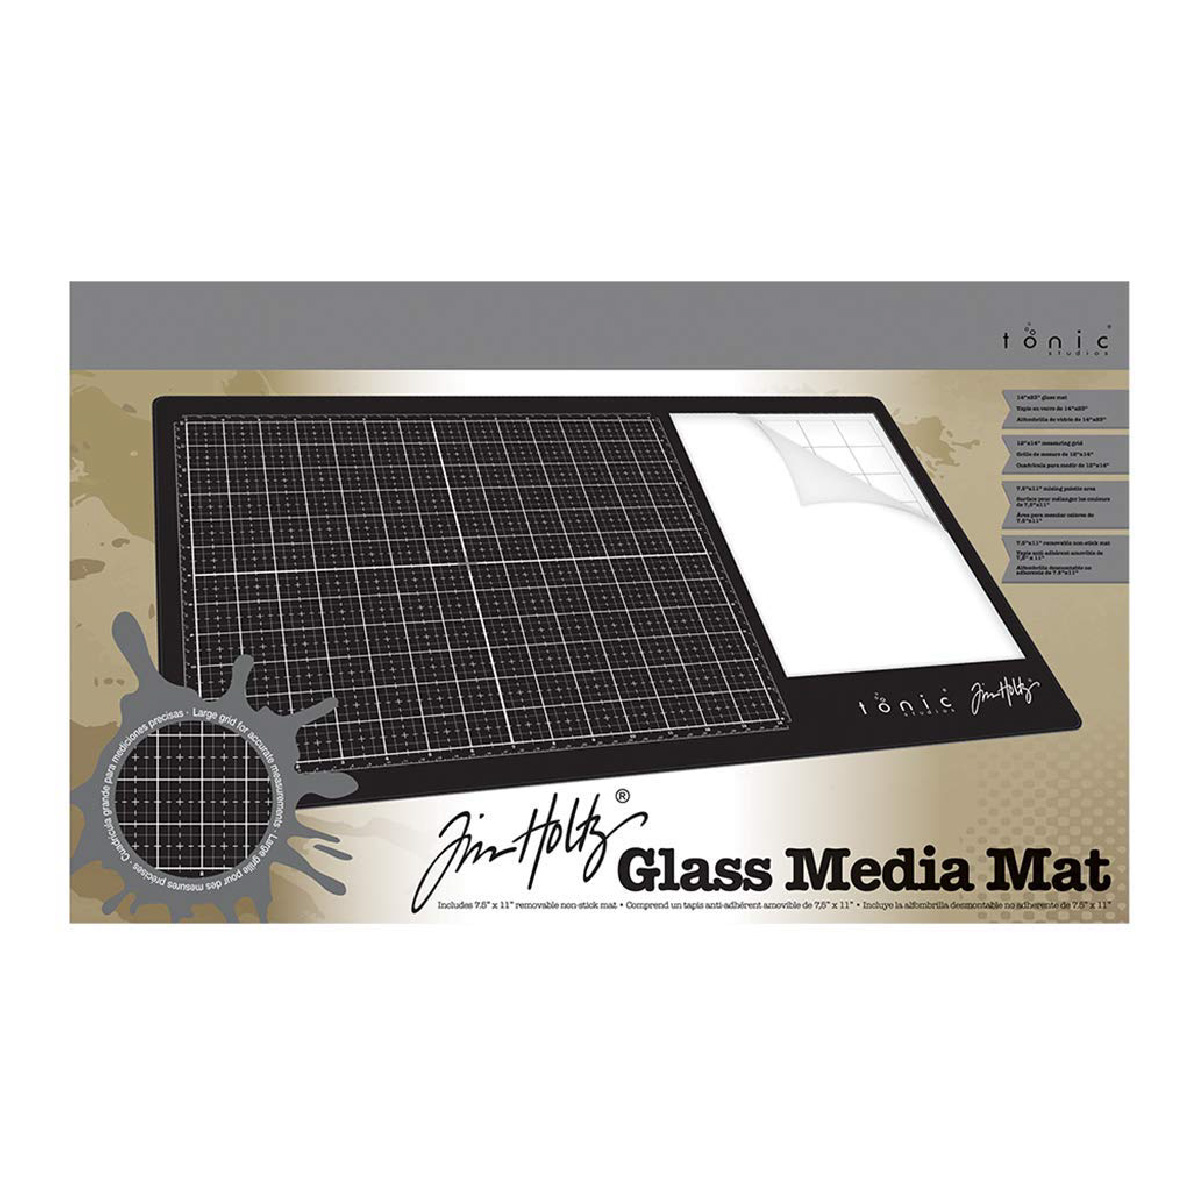 Tonic Glass Media Mat.jpg